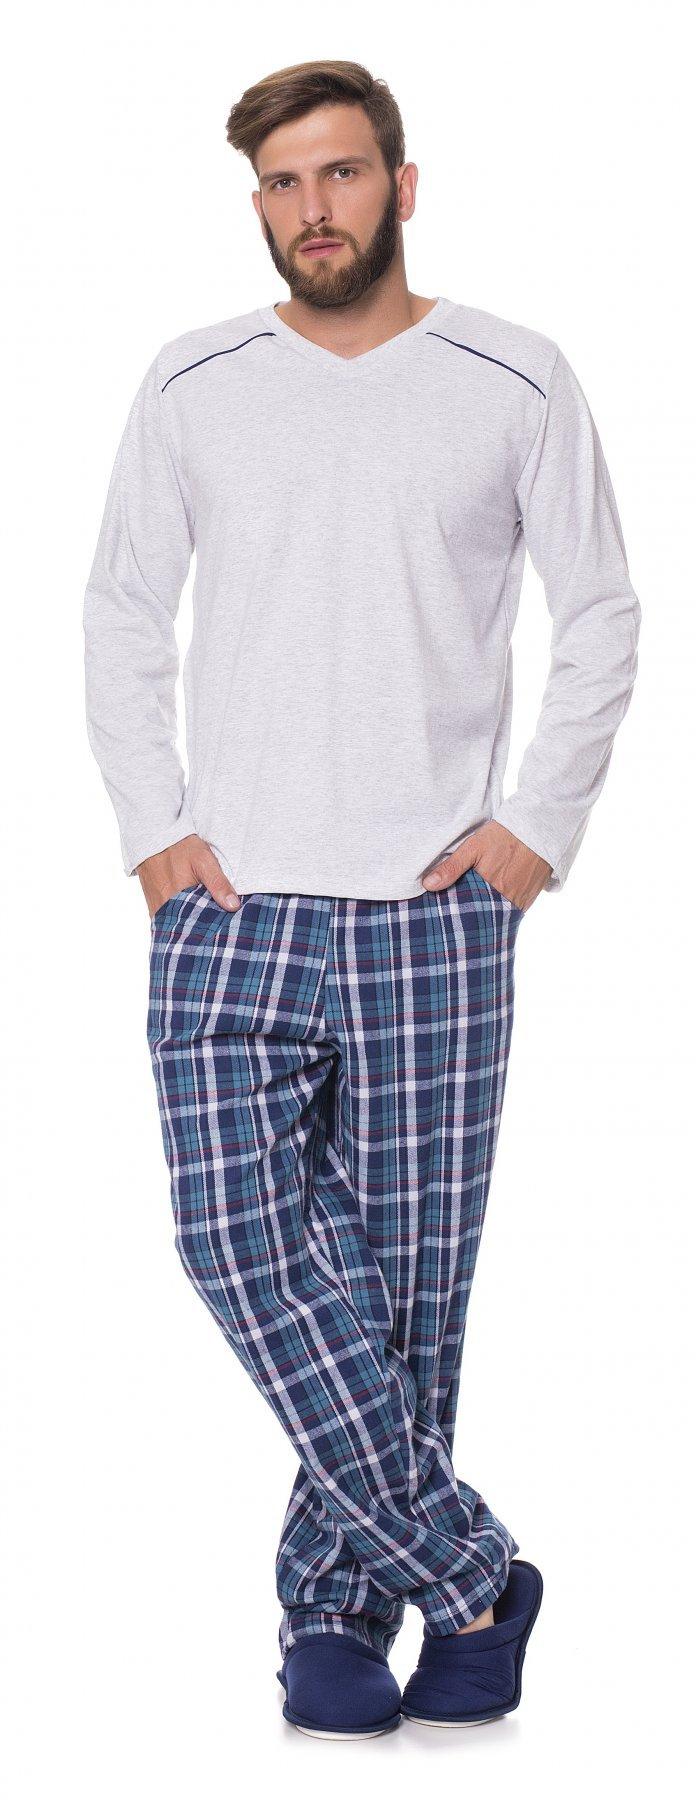 Pijama Longo Masculino Adulto Blusa 1/2 Malha Calça Flanela Casual